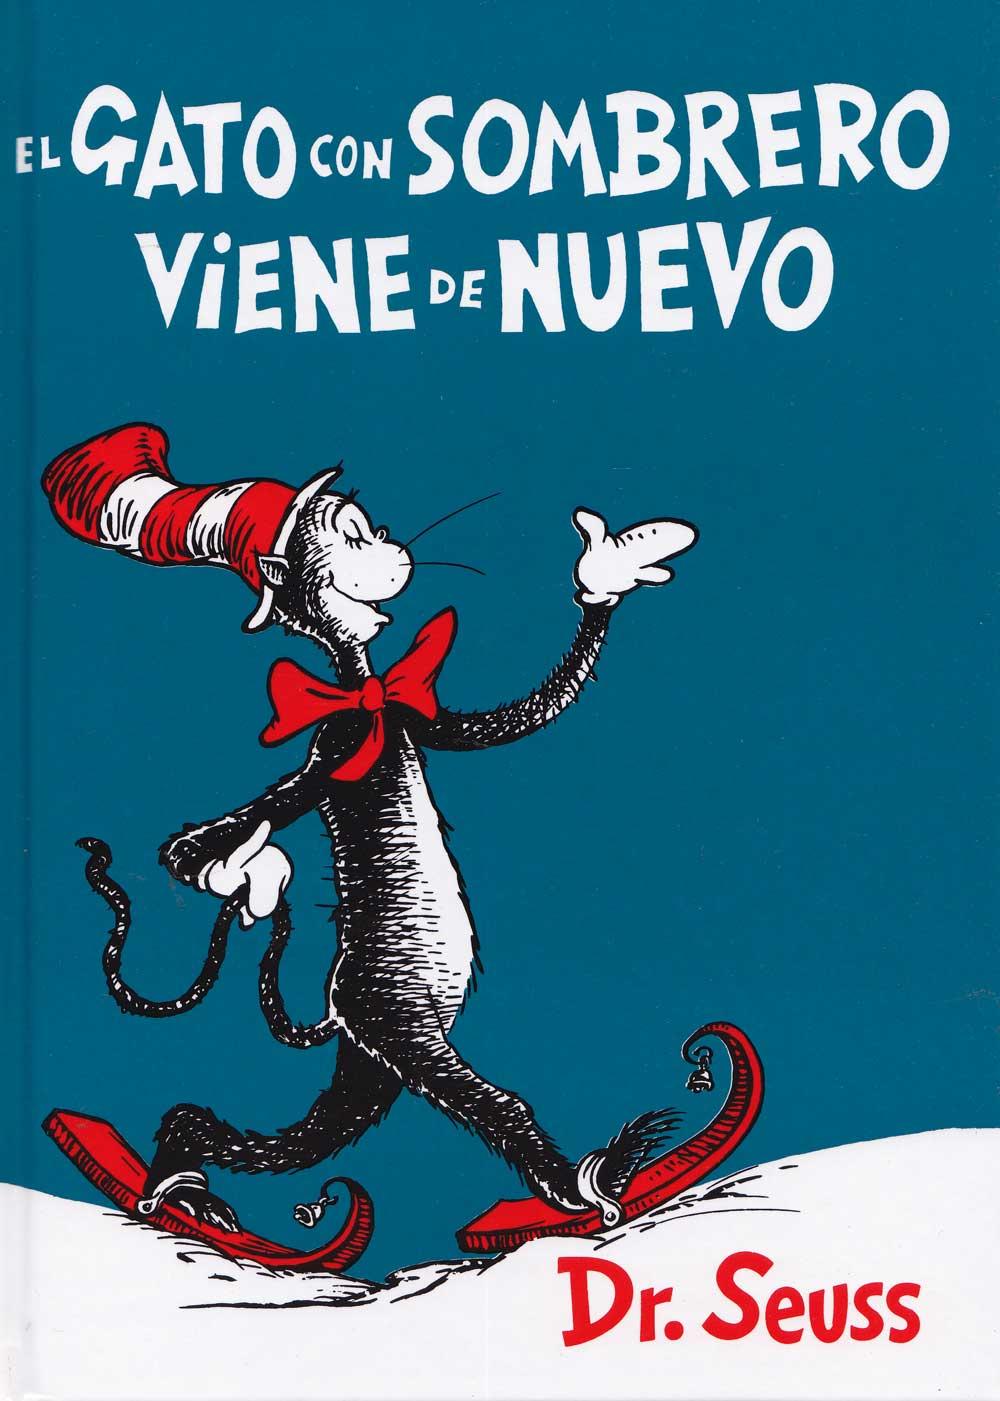 Gato con sombrero viene de nuevo, Hardcover, Spanish ...